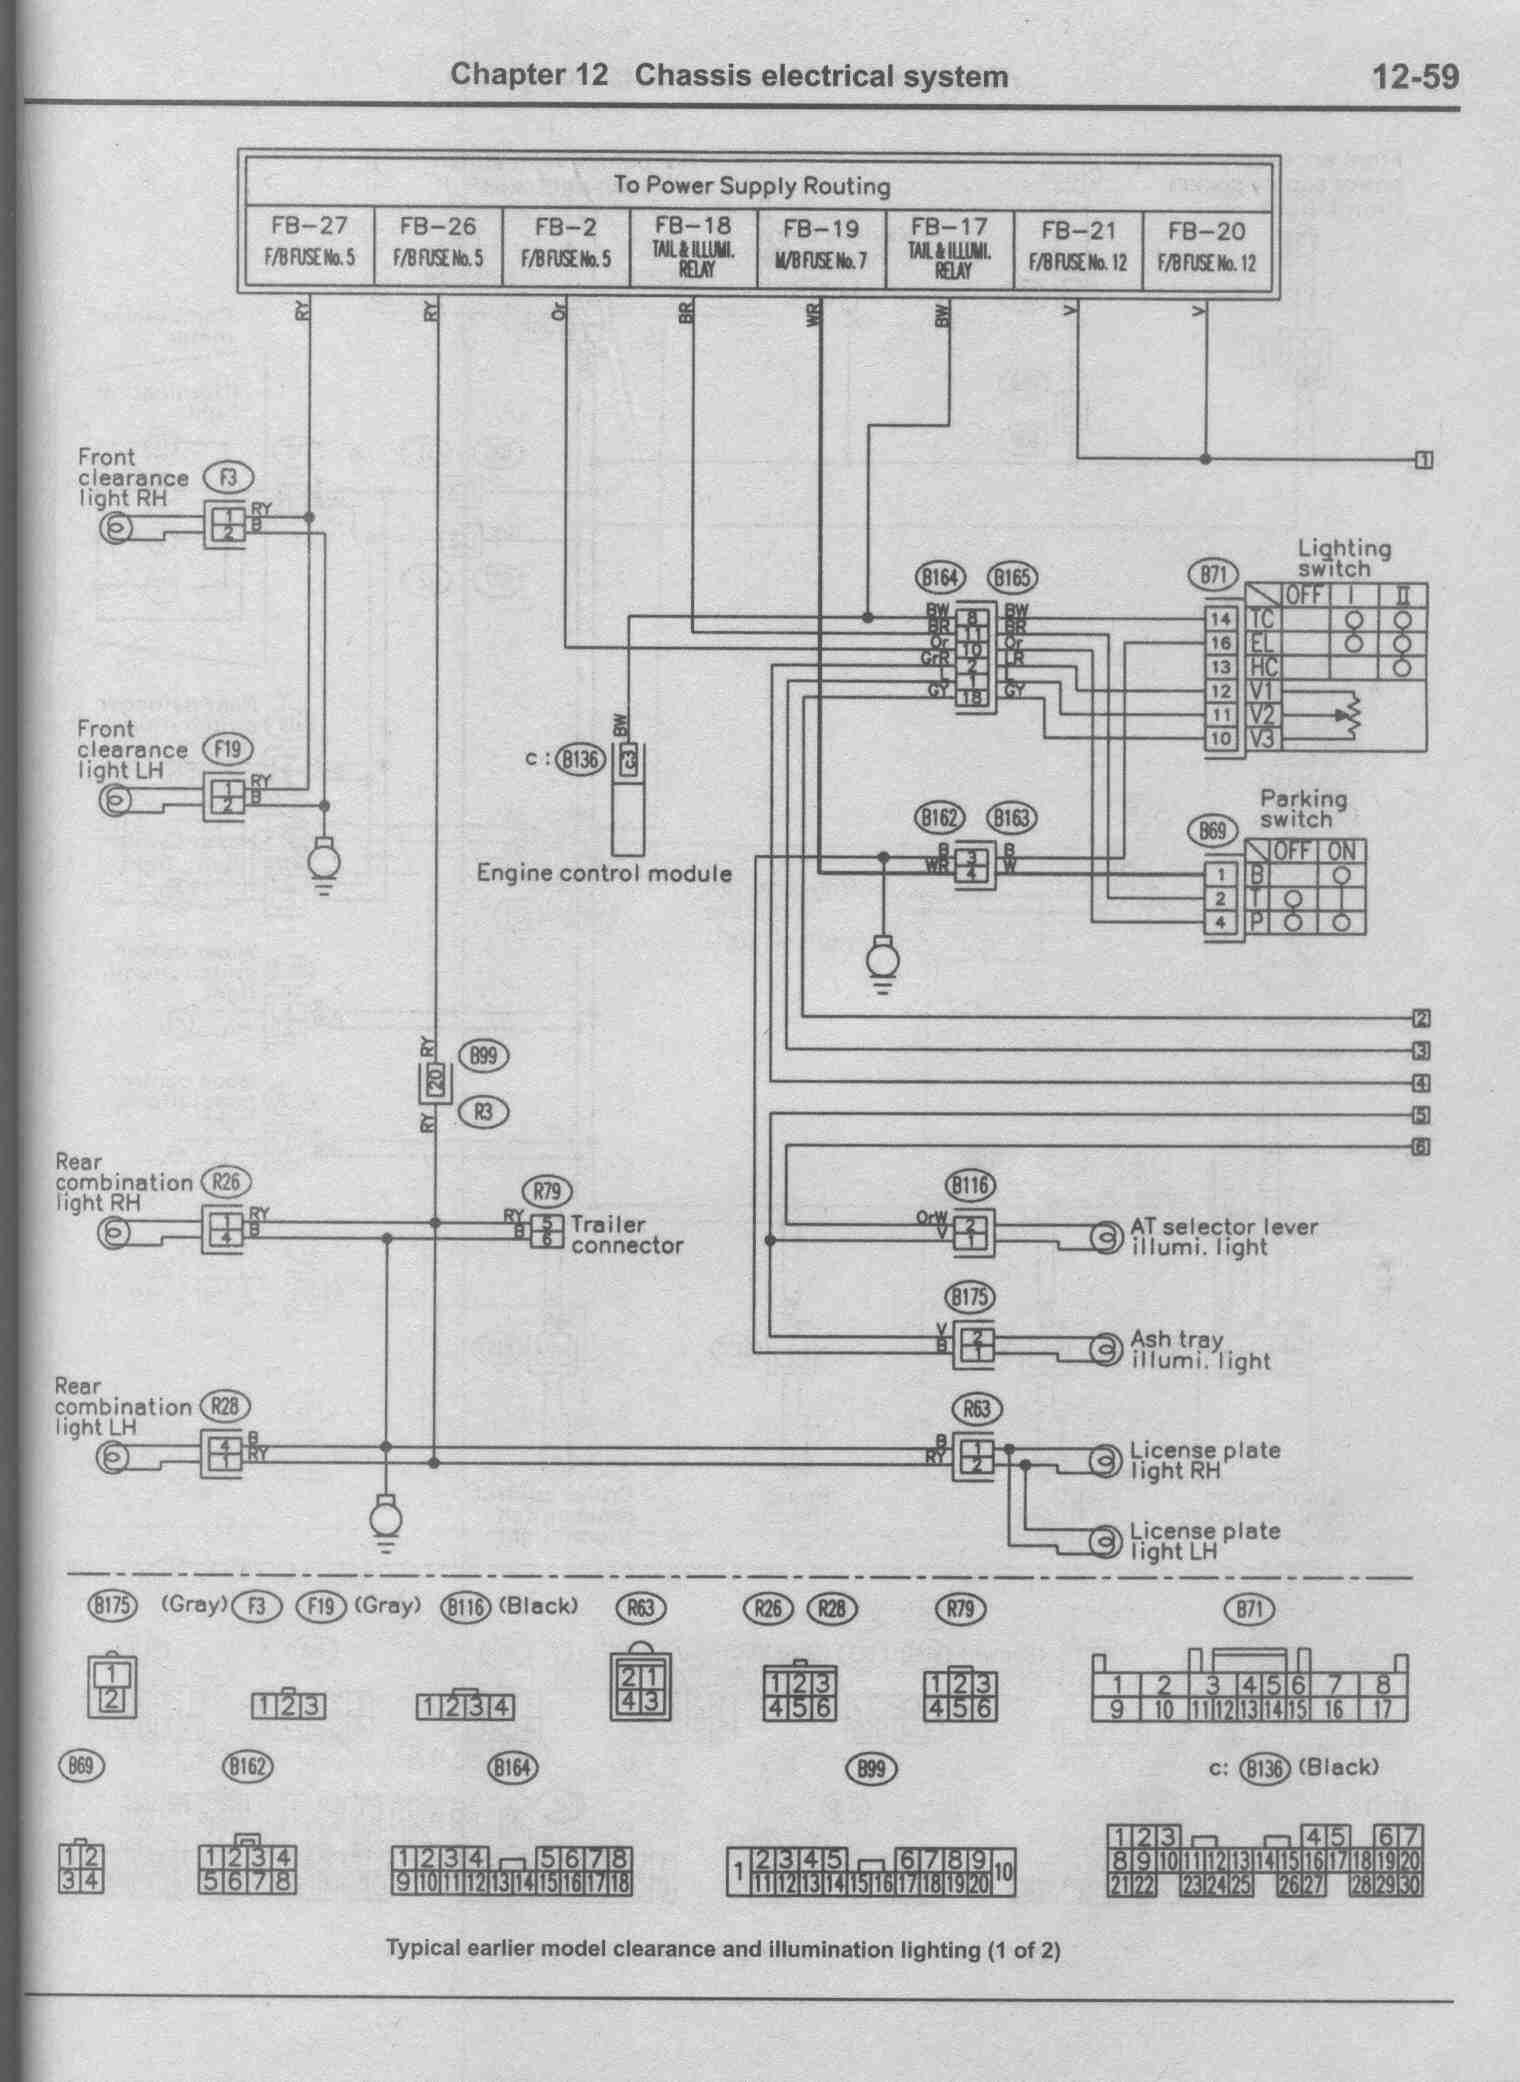 2004 Subaru Outback Electrical Wiring Diagram